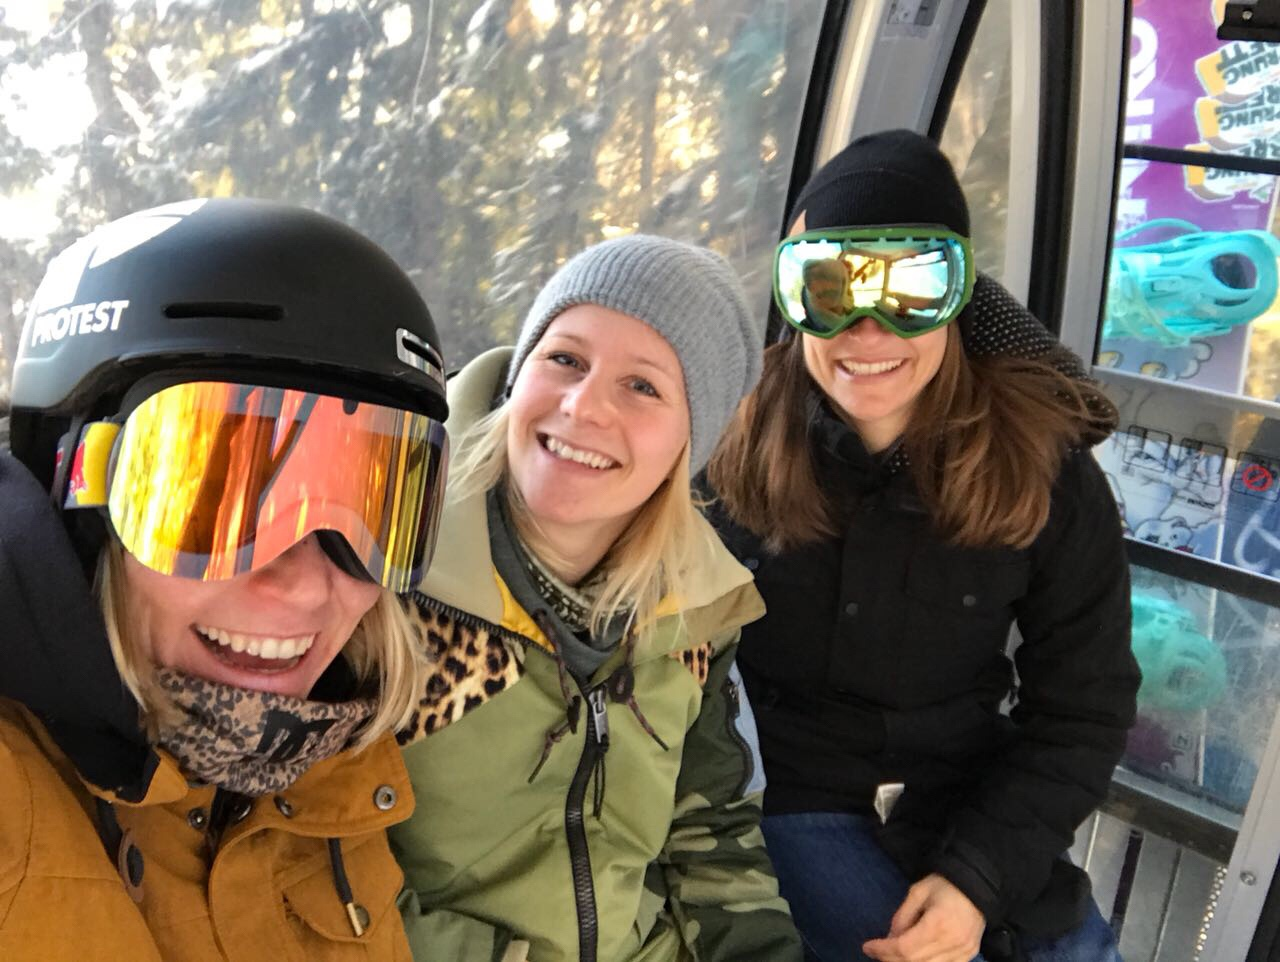 Skigebiet-Alpbachtal-Wildschönau-Ski-Juwel-Gondelstation-Skistation-Pögelbahn-Gondelfahrt-Miss-ahoi-Friends